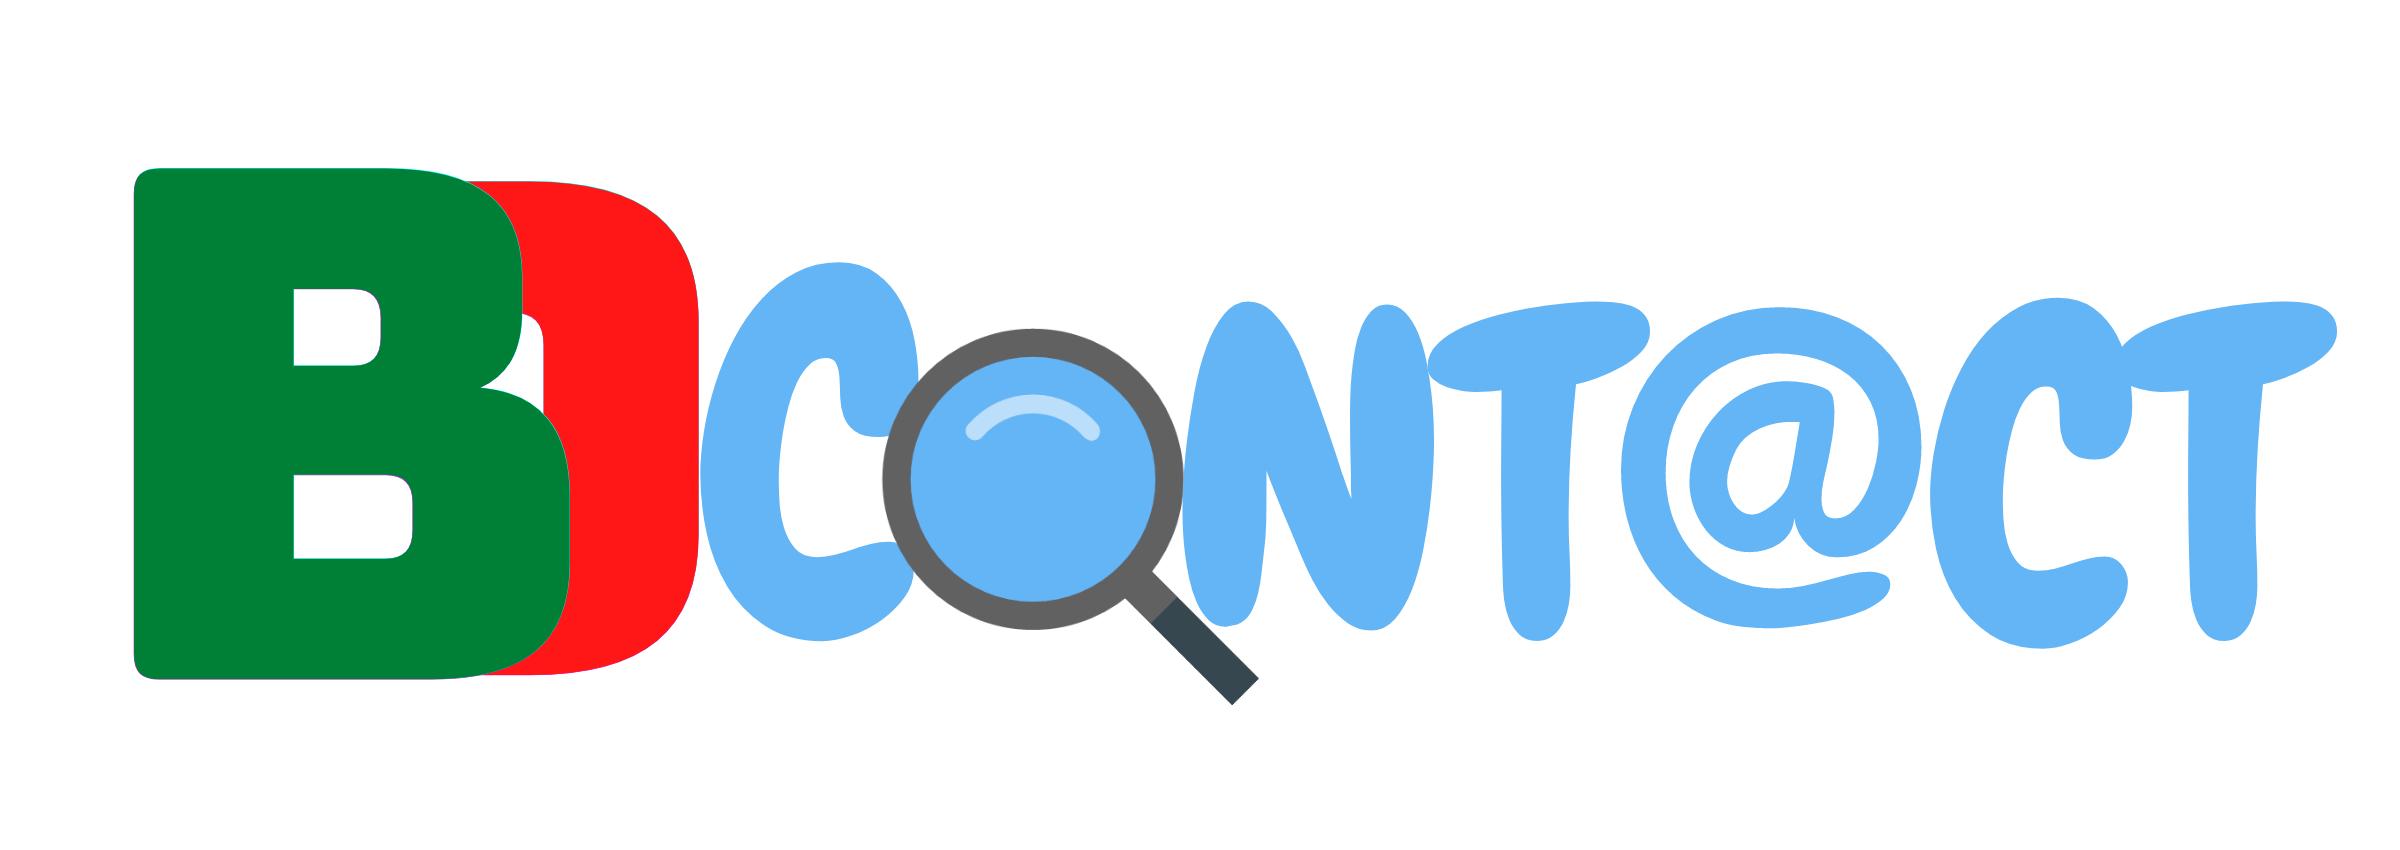 Bangladesh Largest Contact & Information Platform